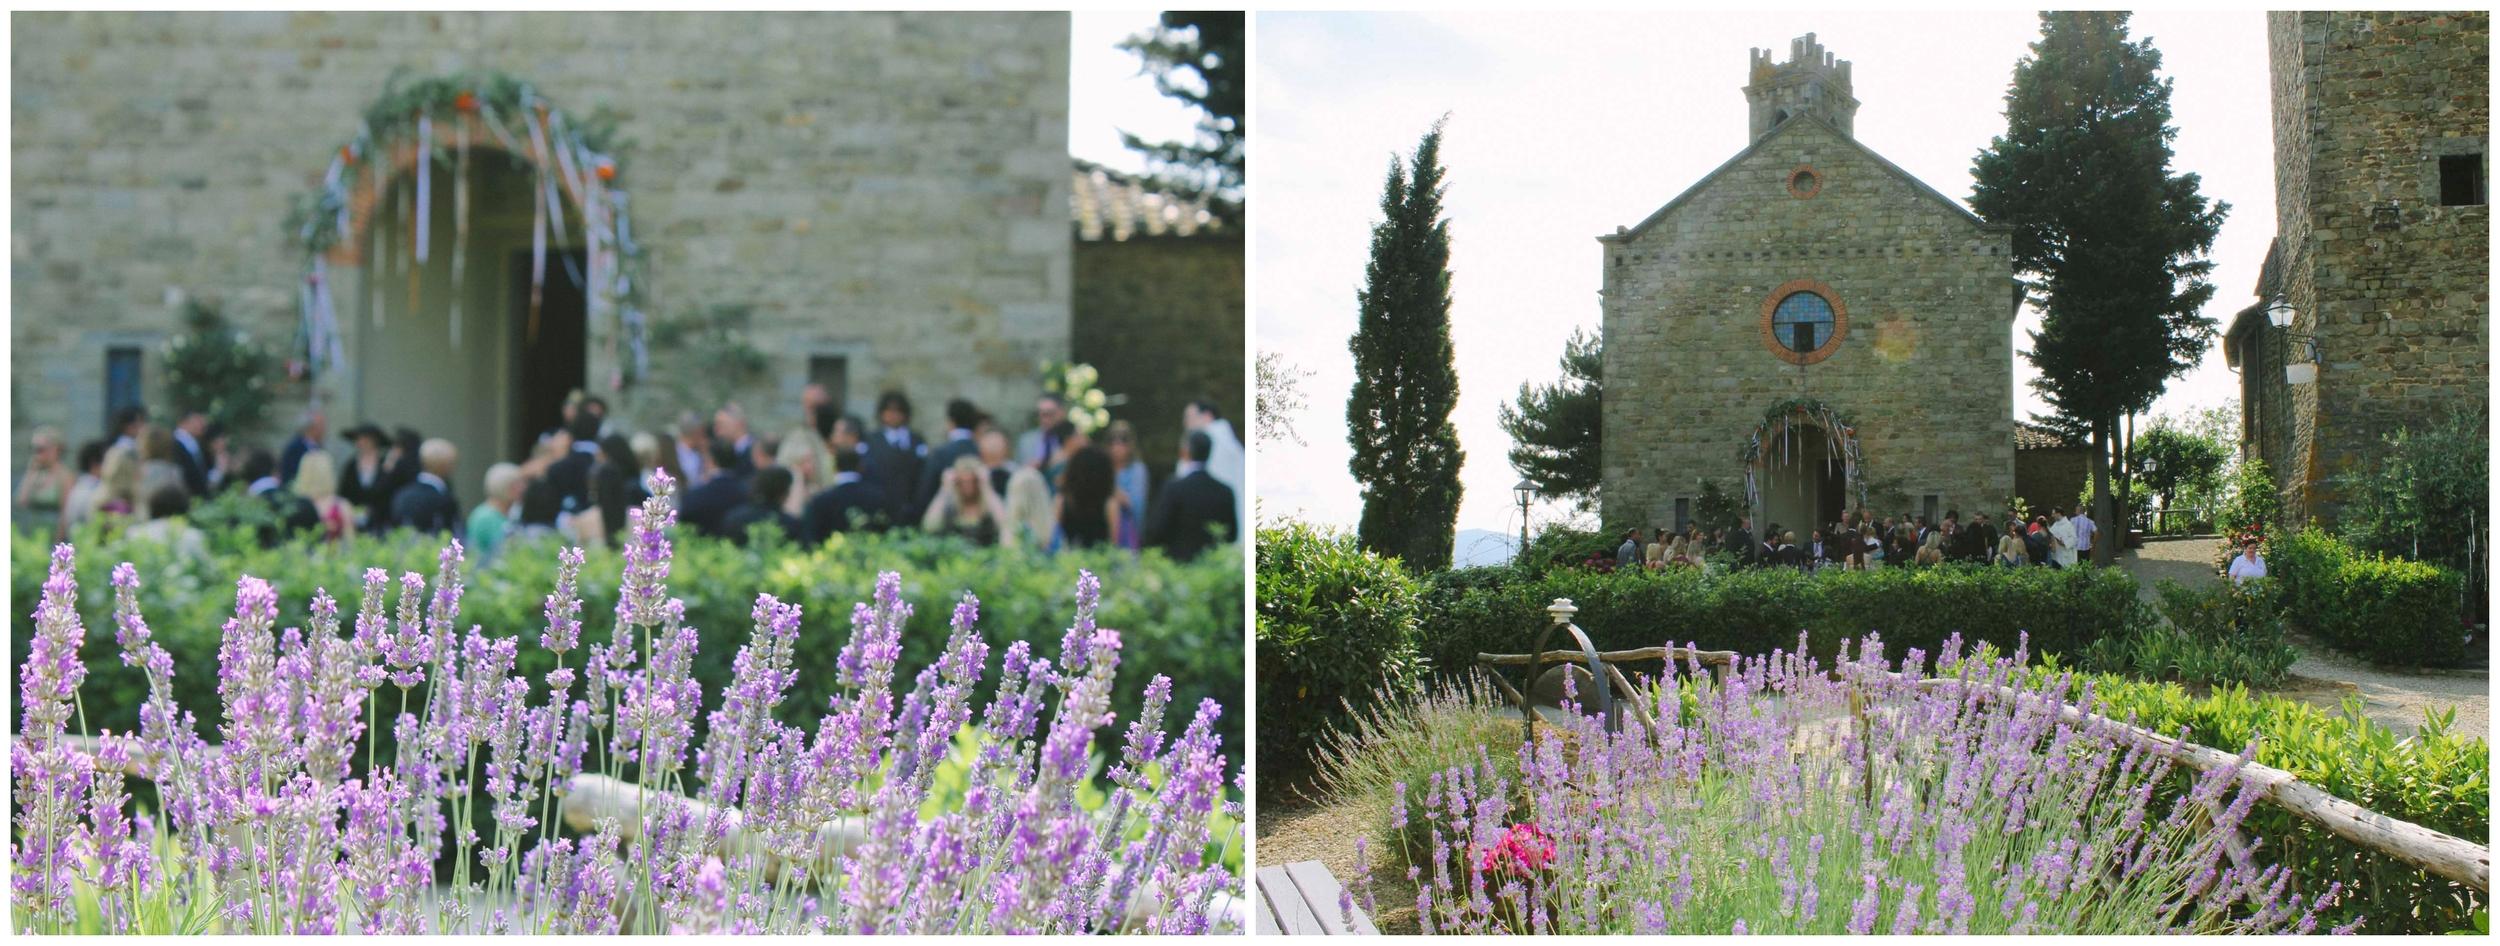 tuscany_wedding-13.jpg